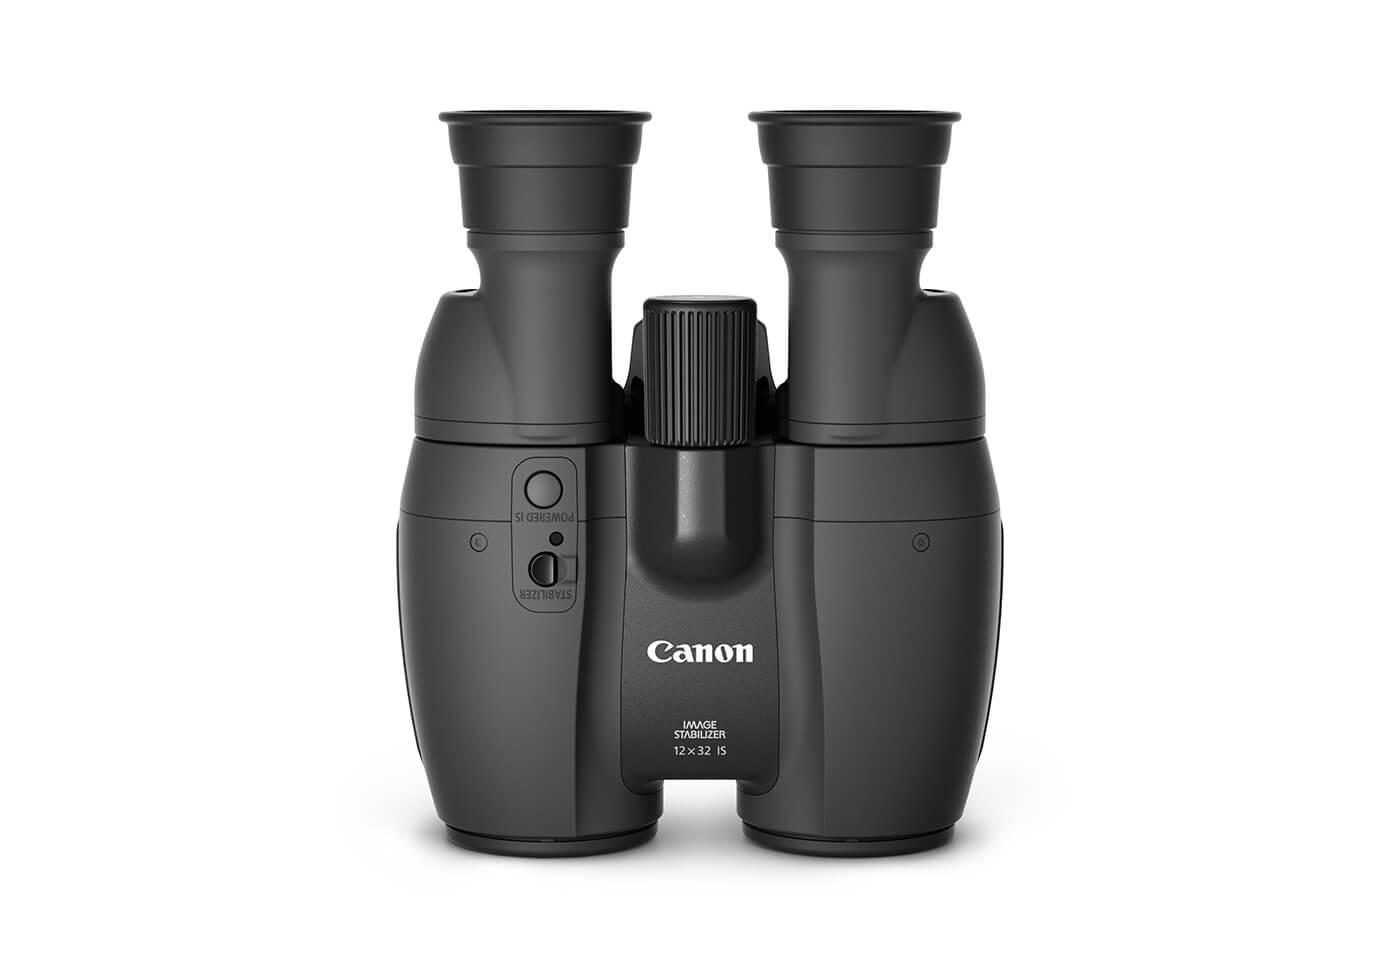 Canon 12x32 binoculars front image